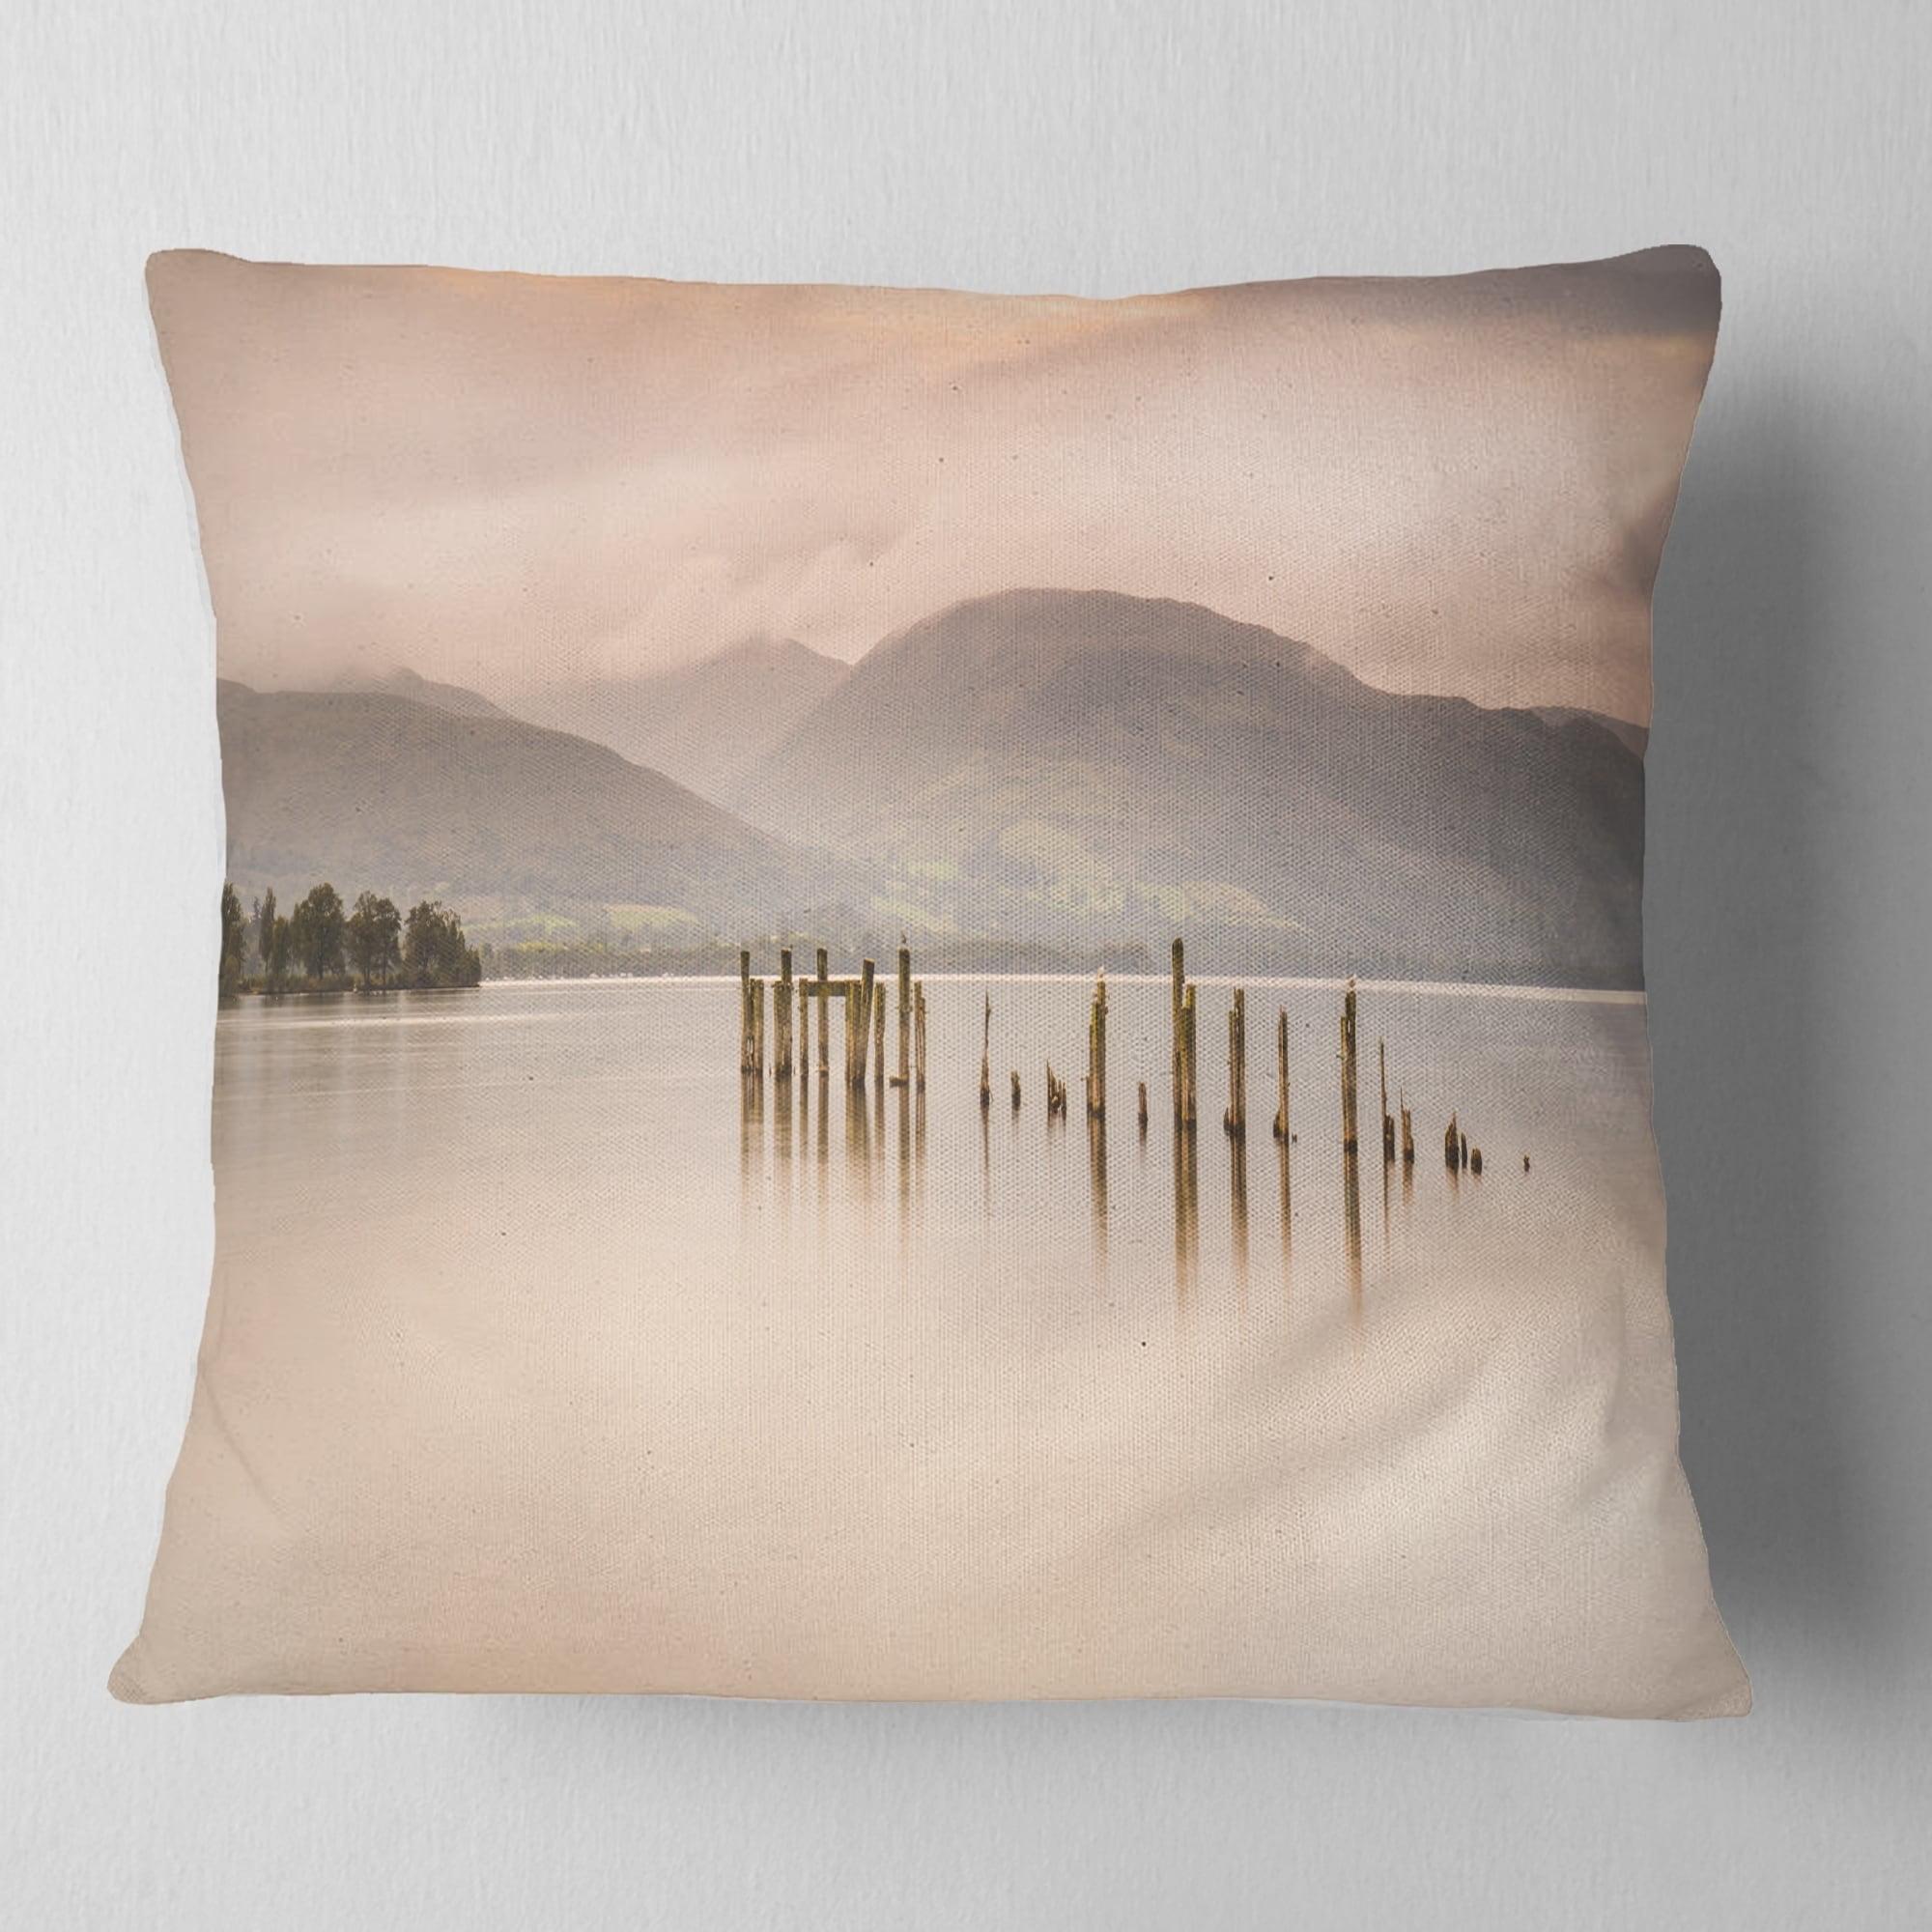 Design Art Designart Loch Lomond Jetty And Mountains Landscape Printed Throw Pillow Walmart Com Walmart Com